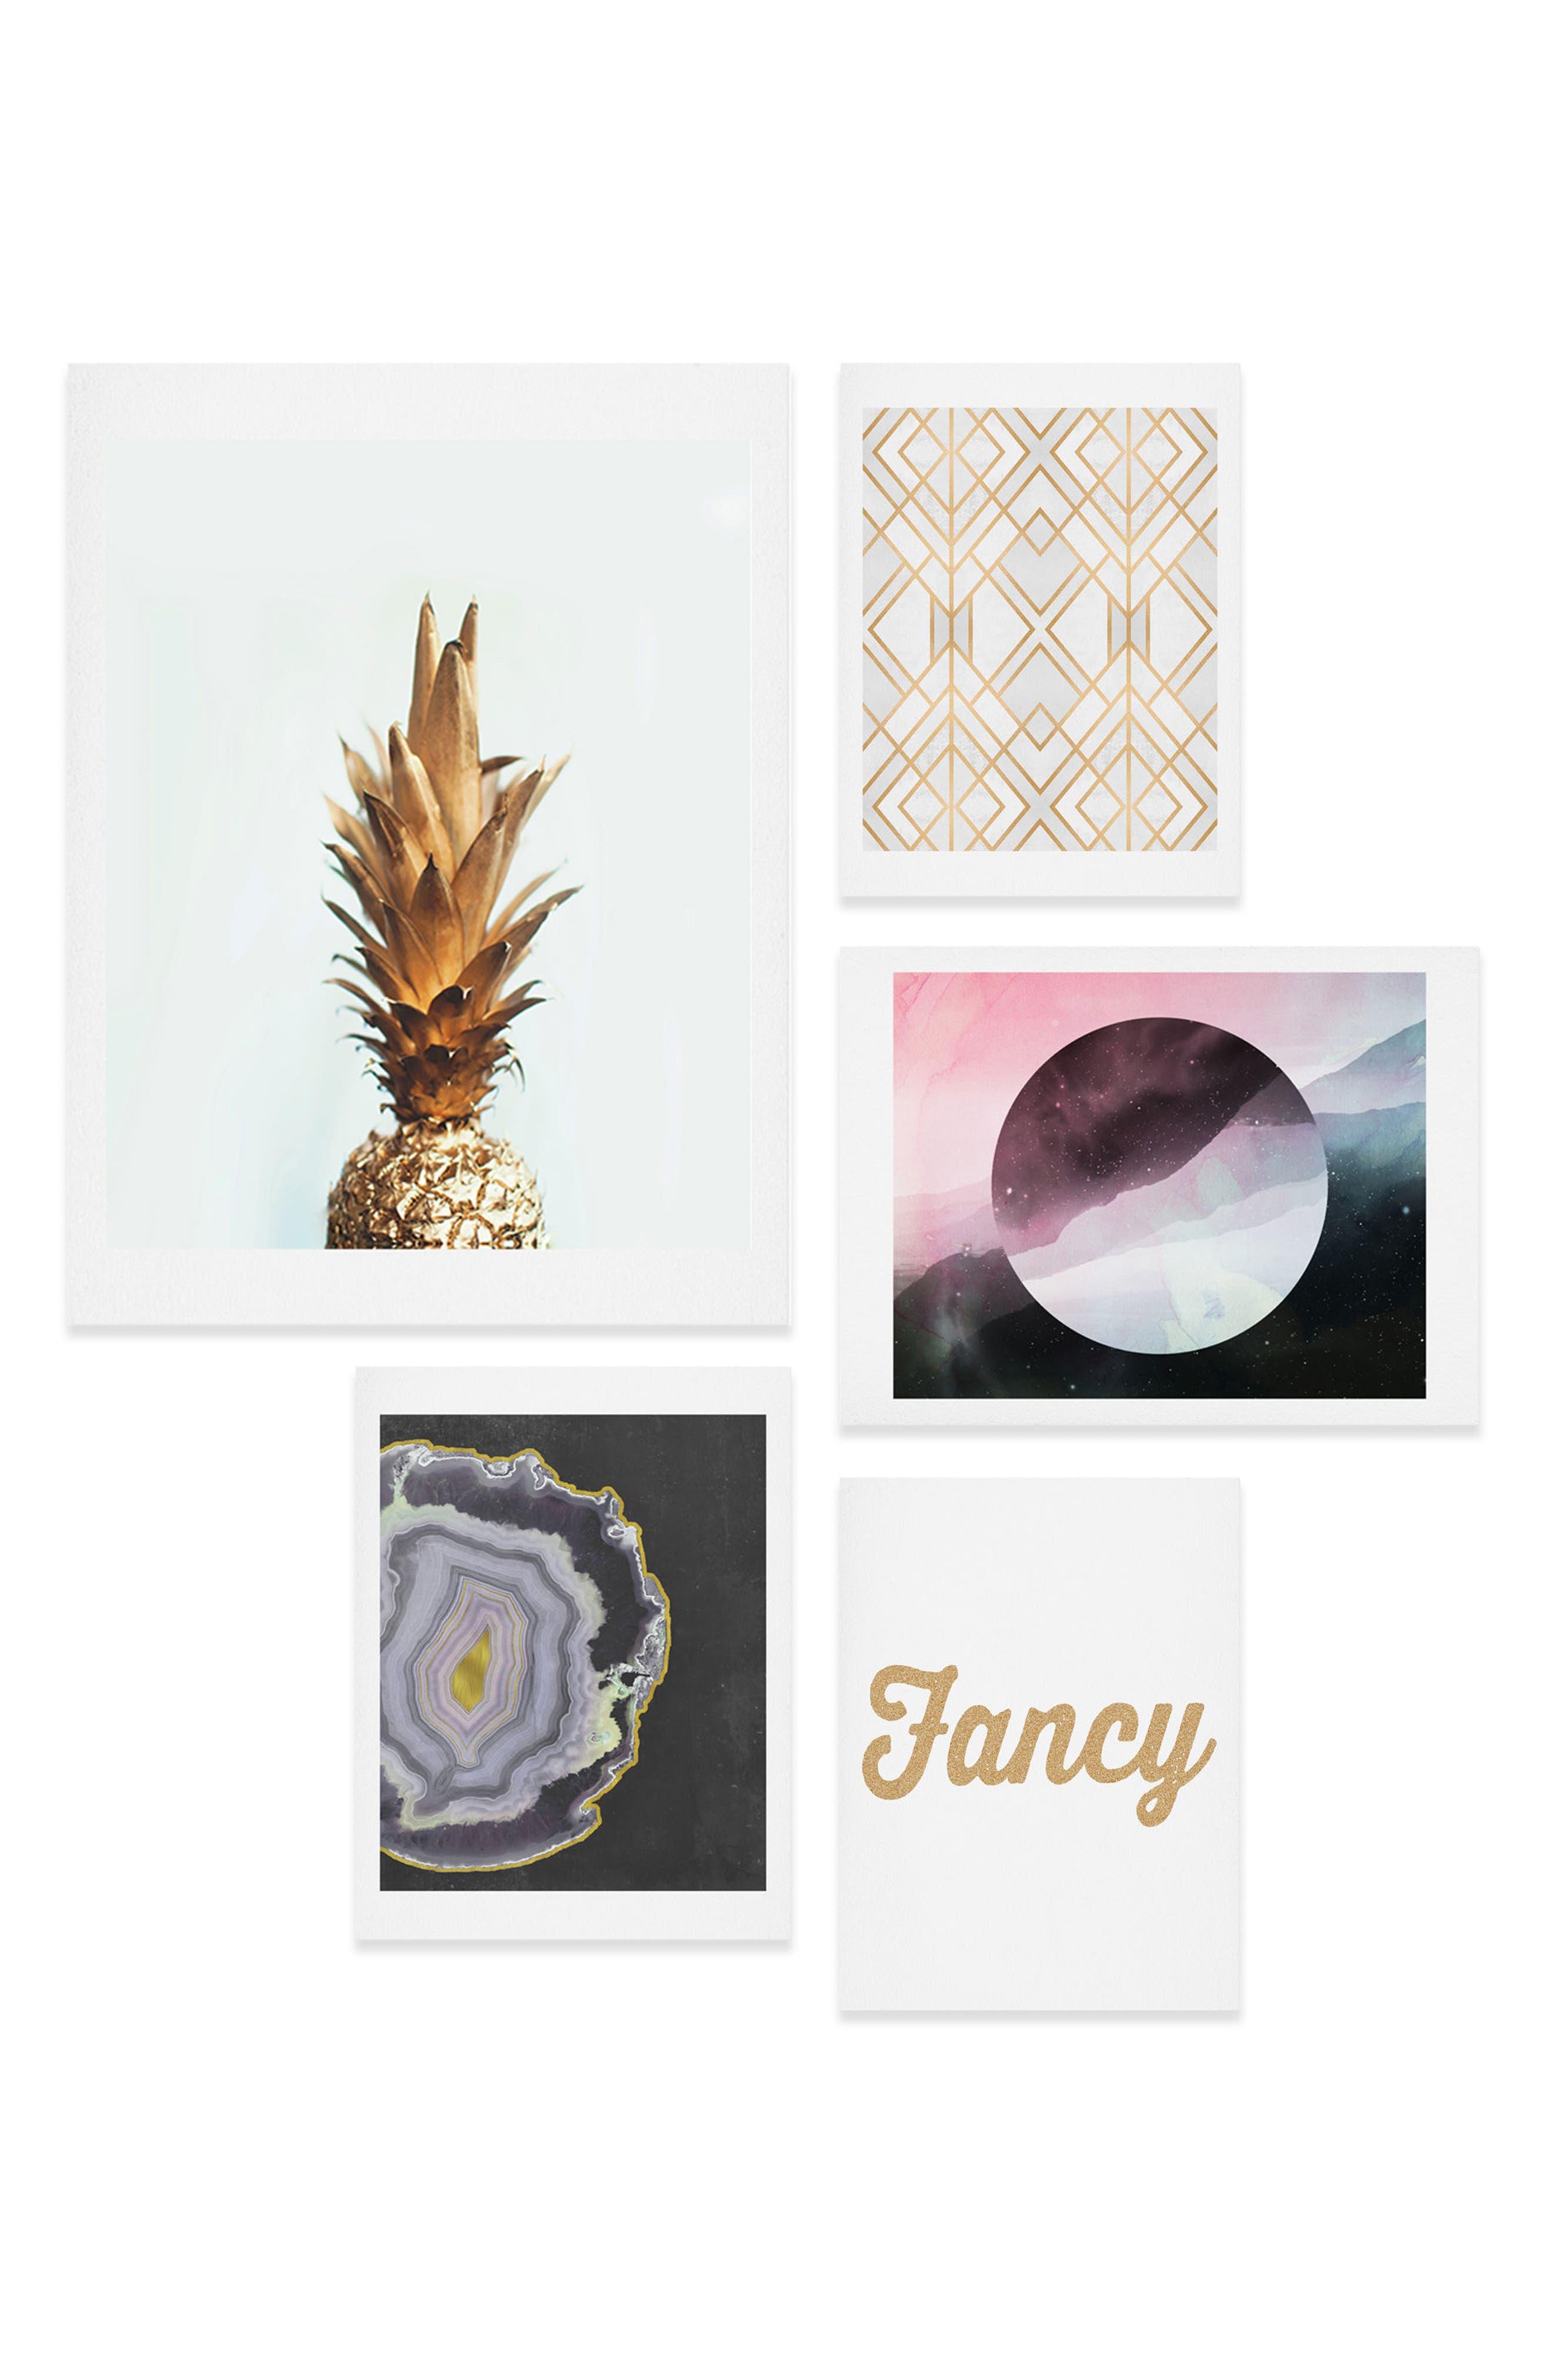 DENY DESIGNS Fancy Five-Piece Gallery Wall Art Print Set, Main, color, 710